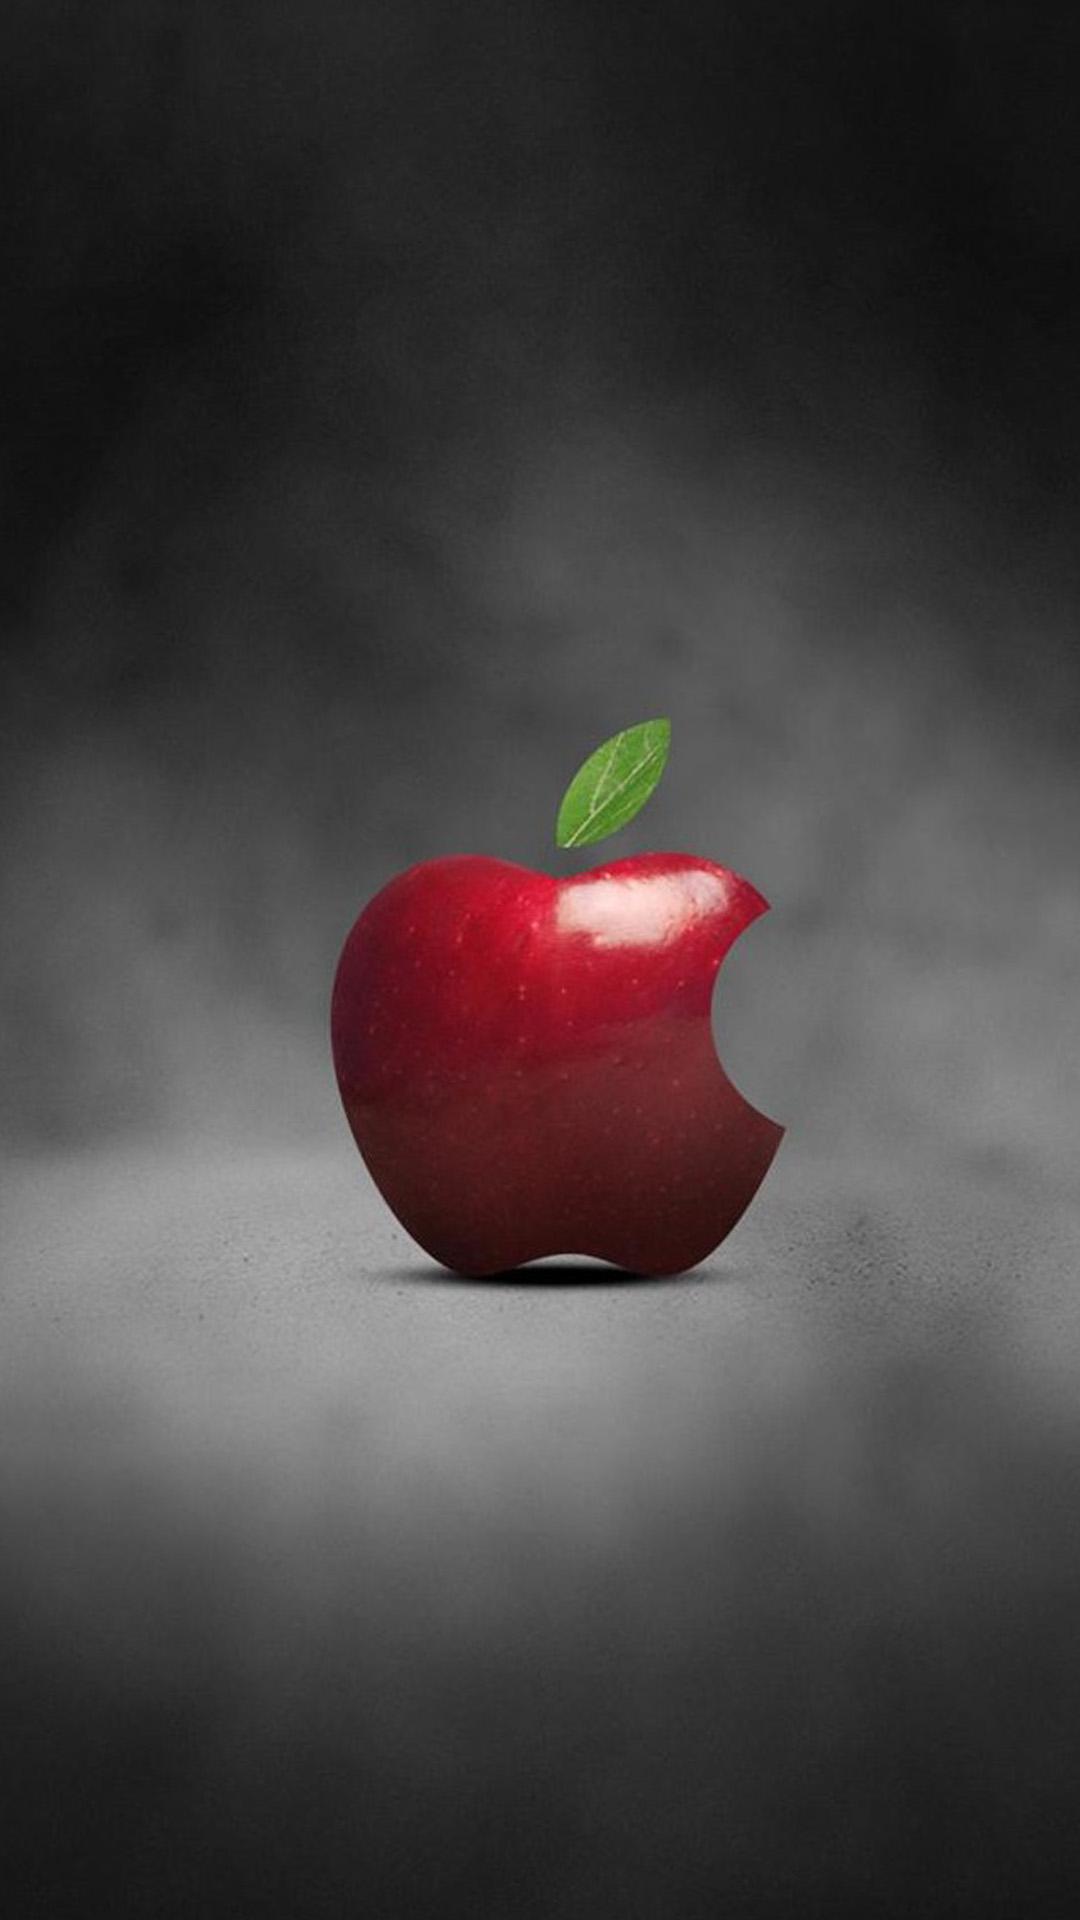 Apple Iphone 6 Plus Wallpaper Apple Wallpaper Hd Iphone 6